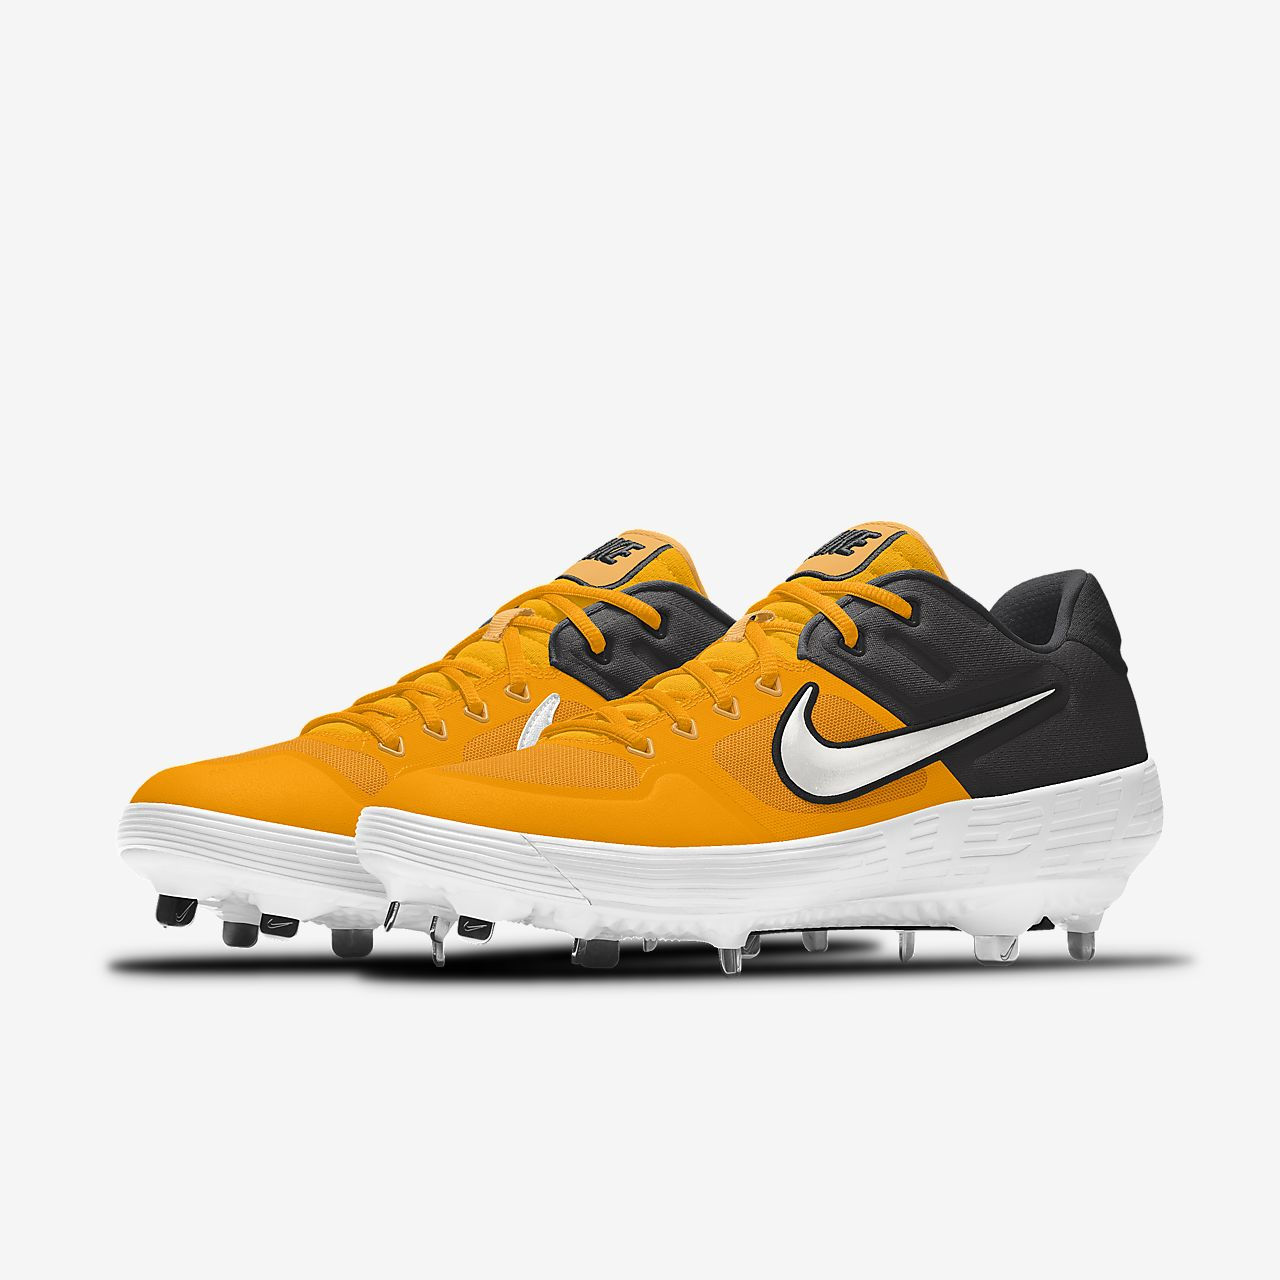 Personalizowane korki do gry w baseball Nike Alpha Huarache Elite 2 Low By You